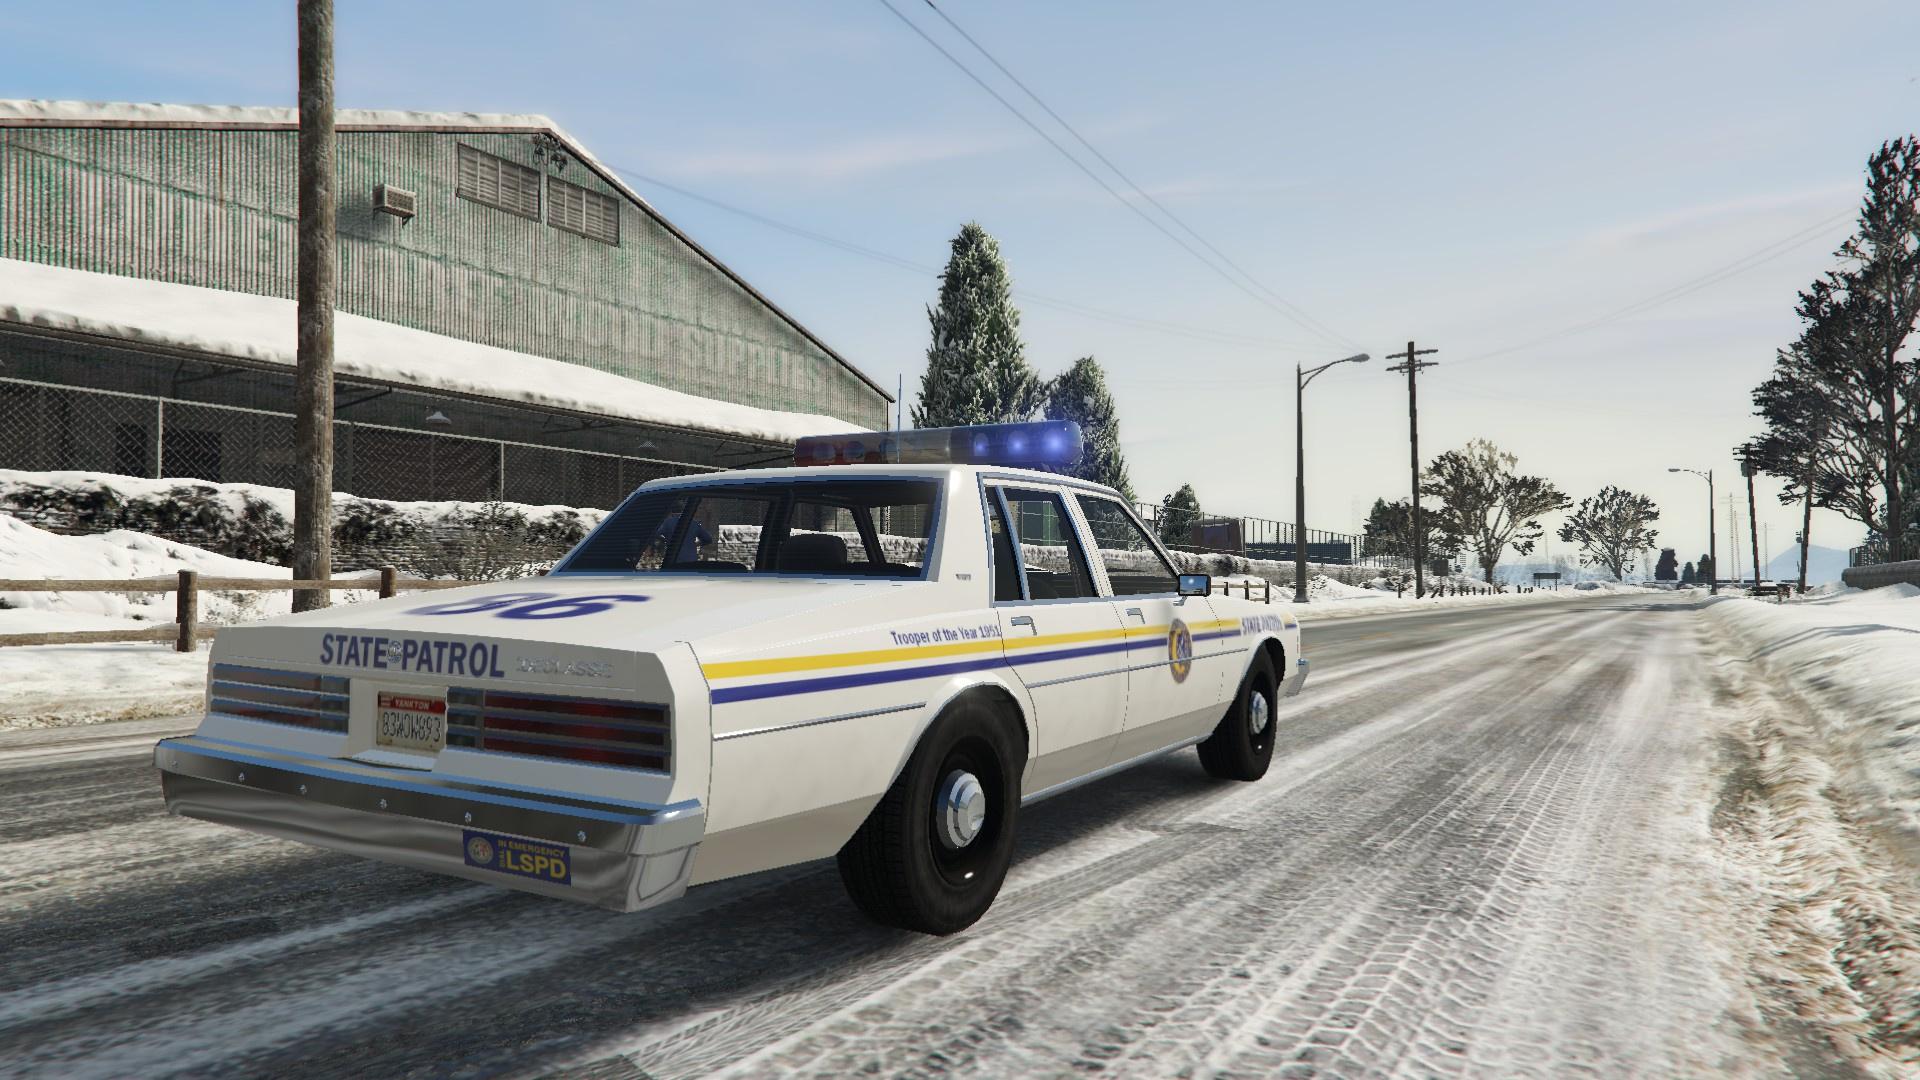 Mb Sprinter 2018 >> North Yankton State Patrol Retro Livery Pack - GTA5-Mods.com